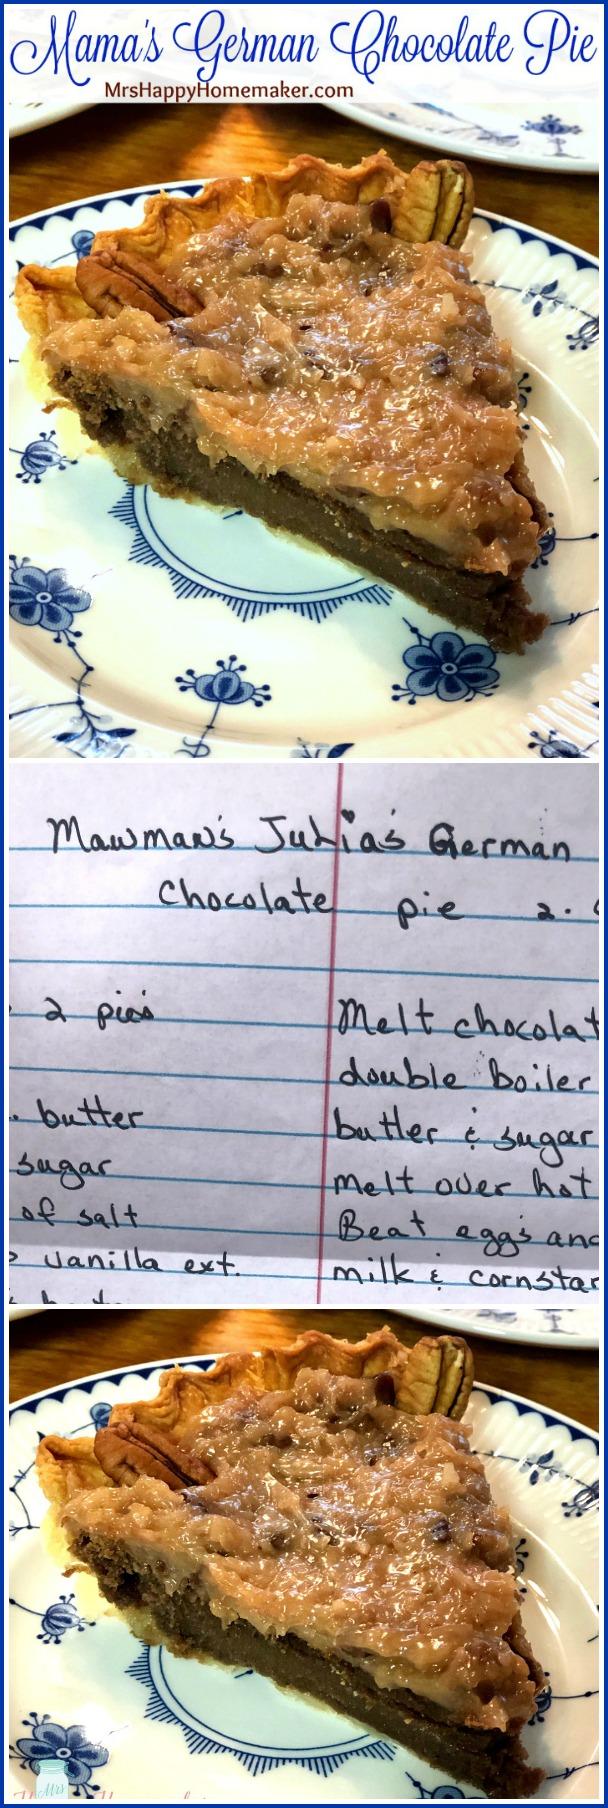 Mama's German Chocolate Pie - aka my most FAVORITE DESSERT IN THE ENTIRE WORLD! | MrsHappyHomemaker.com @MrsHappyHomemaker #germanchocolatepie #chocolatepie #pie #dessert #bestever